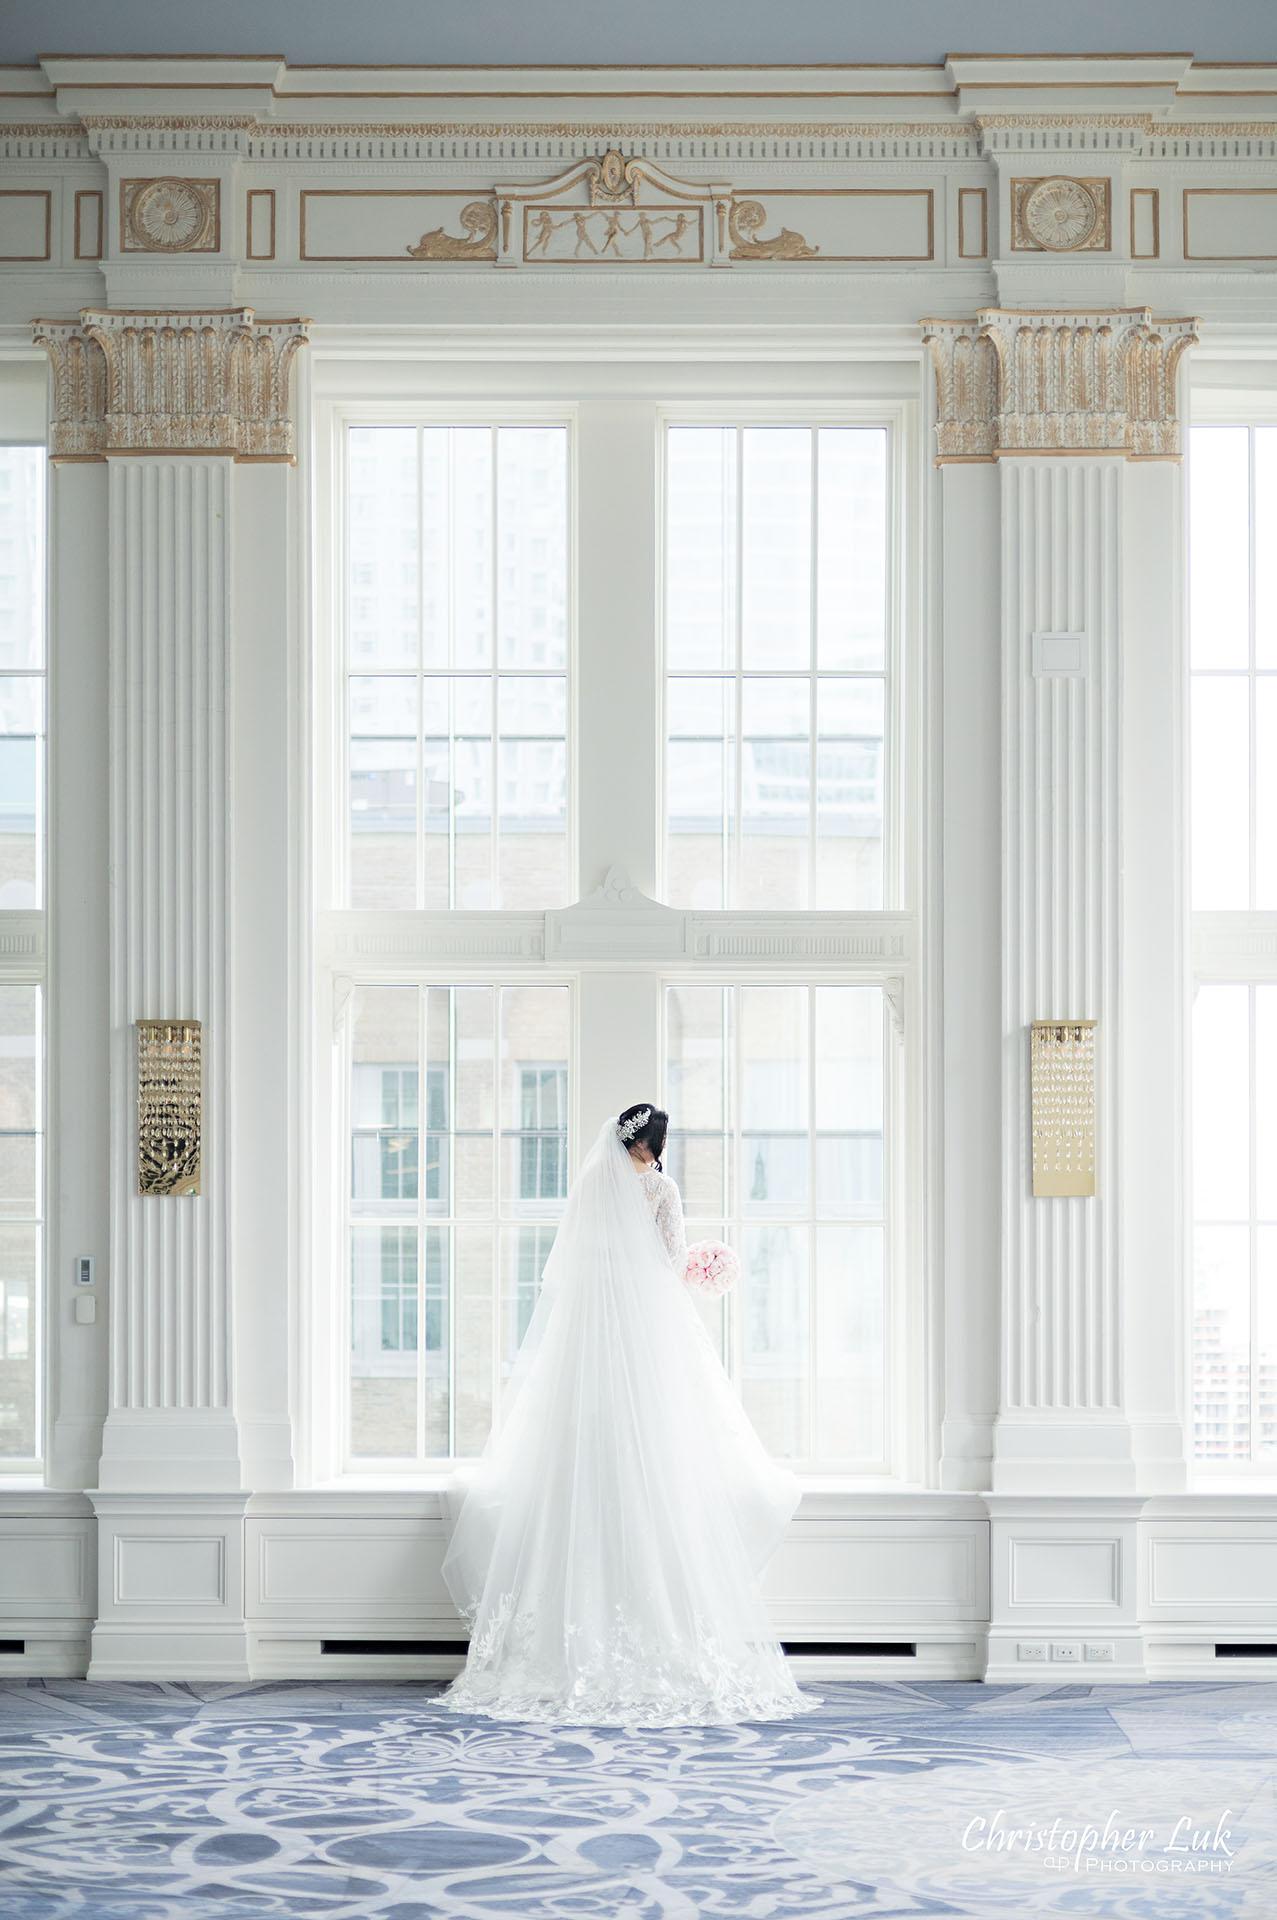 King Edward Hotel Crystal Ballroom Toronto Wedding Photographer MicroWedding Bride Window Frame Long Train Bridal Dress Gown Cathedral Veil Bouquet Portrait